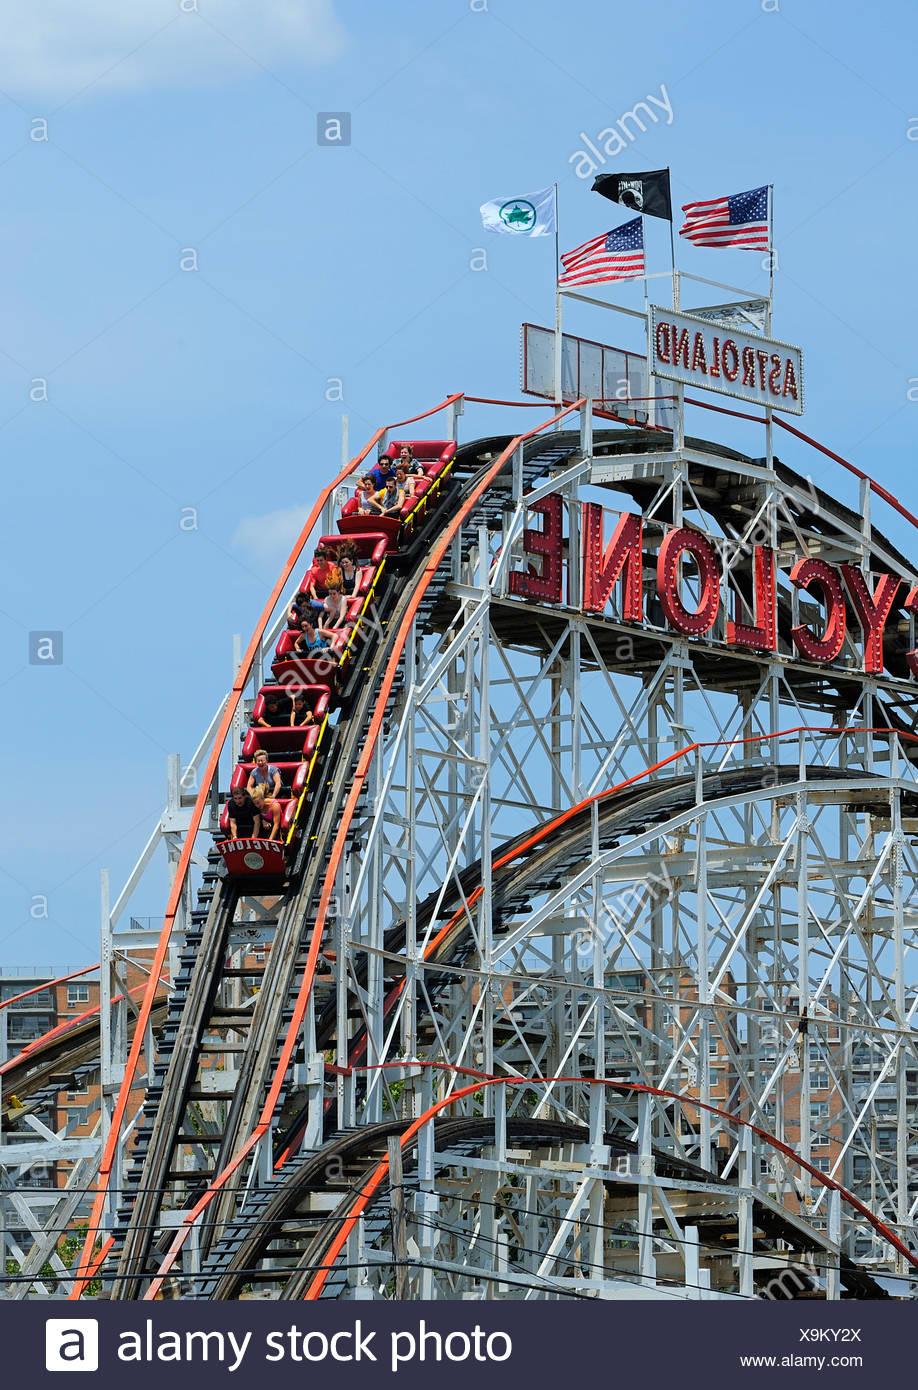 Coney Island Cyclone Rollercoaster Astroland Park Coney Island New York Usa Stock Photo Alamy